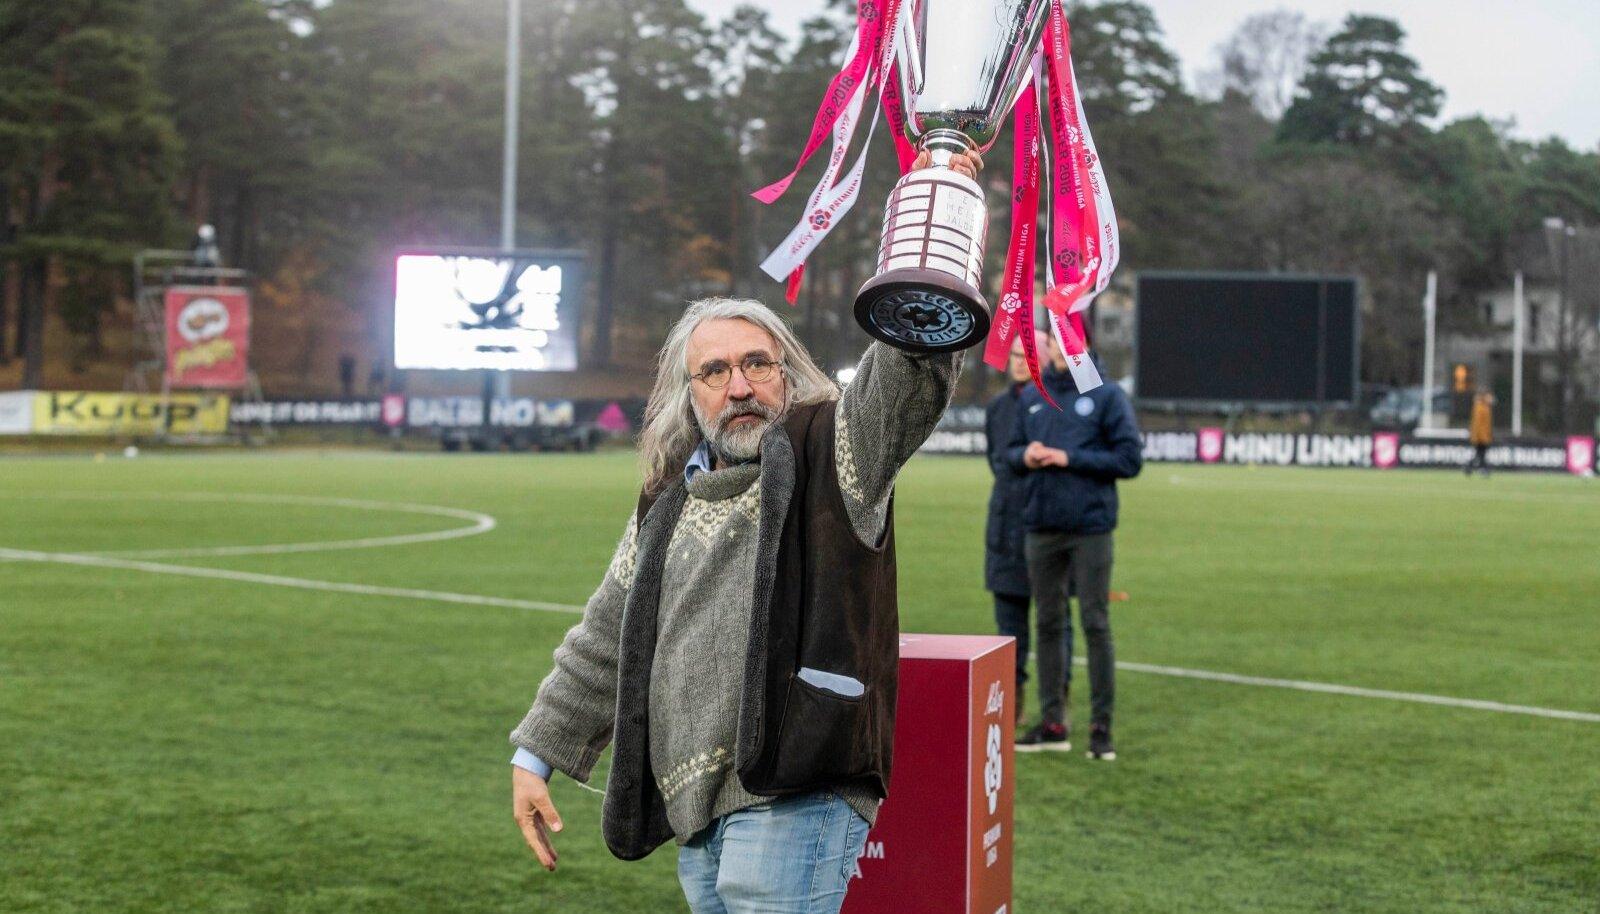 Eesti Jalgpalli Liidu president Aivar Pohlak.